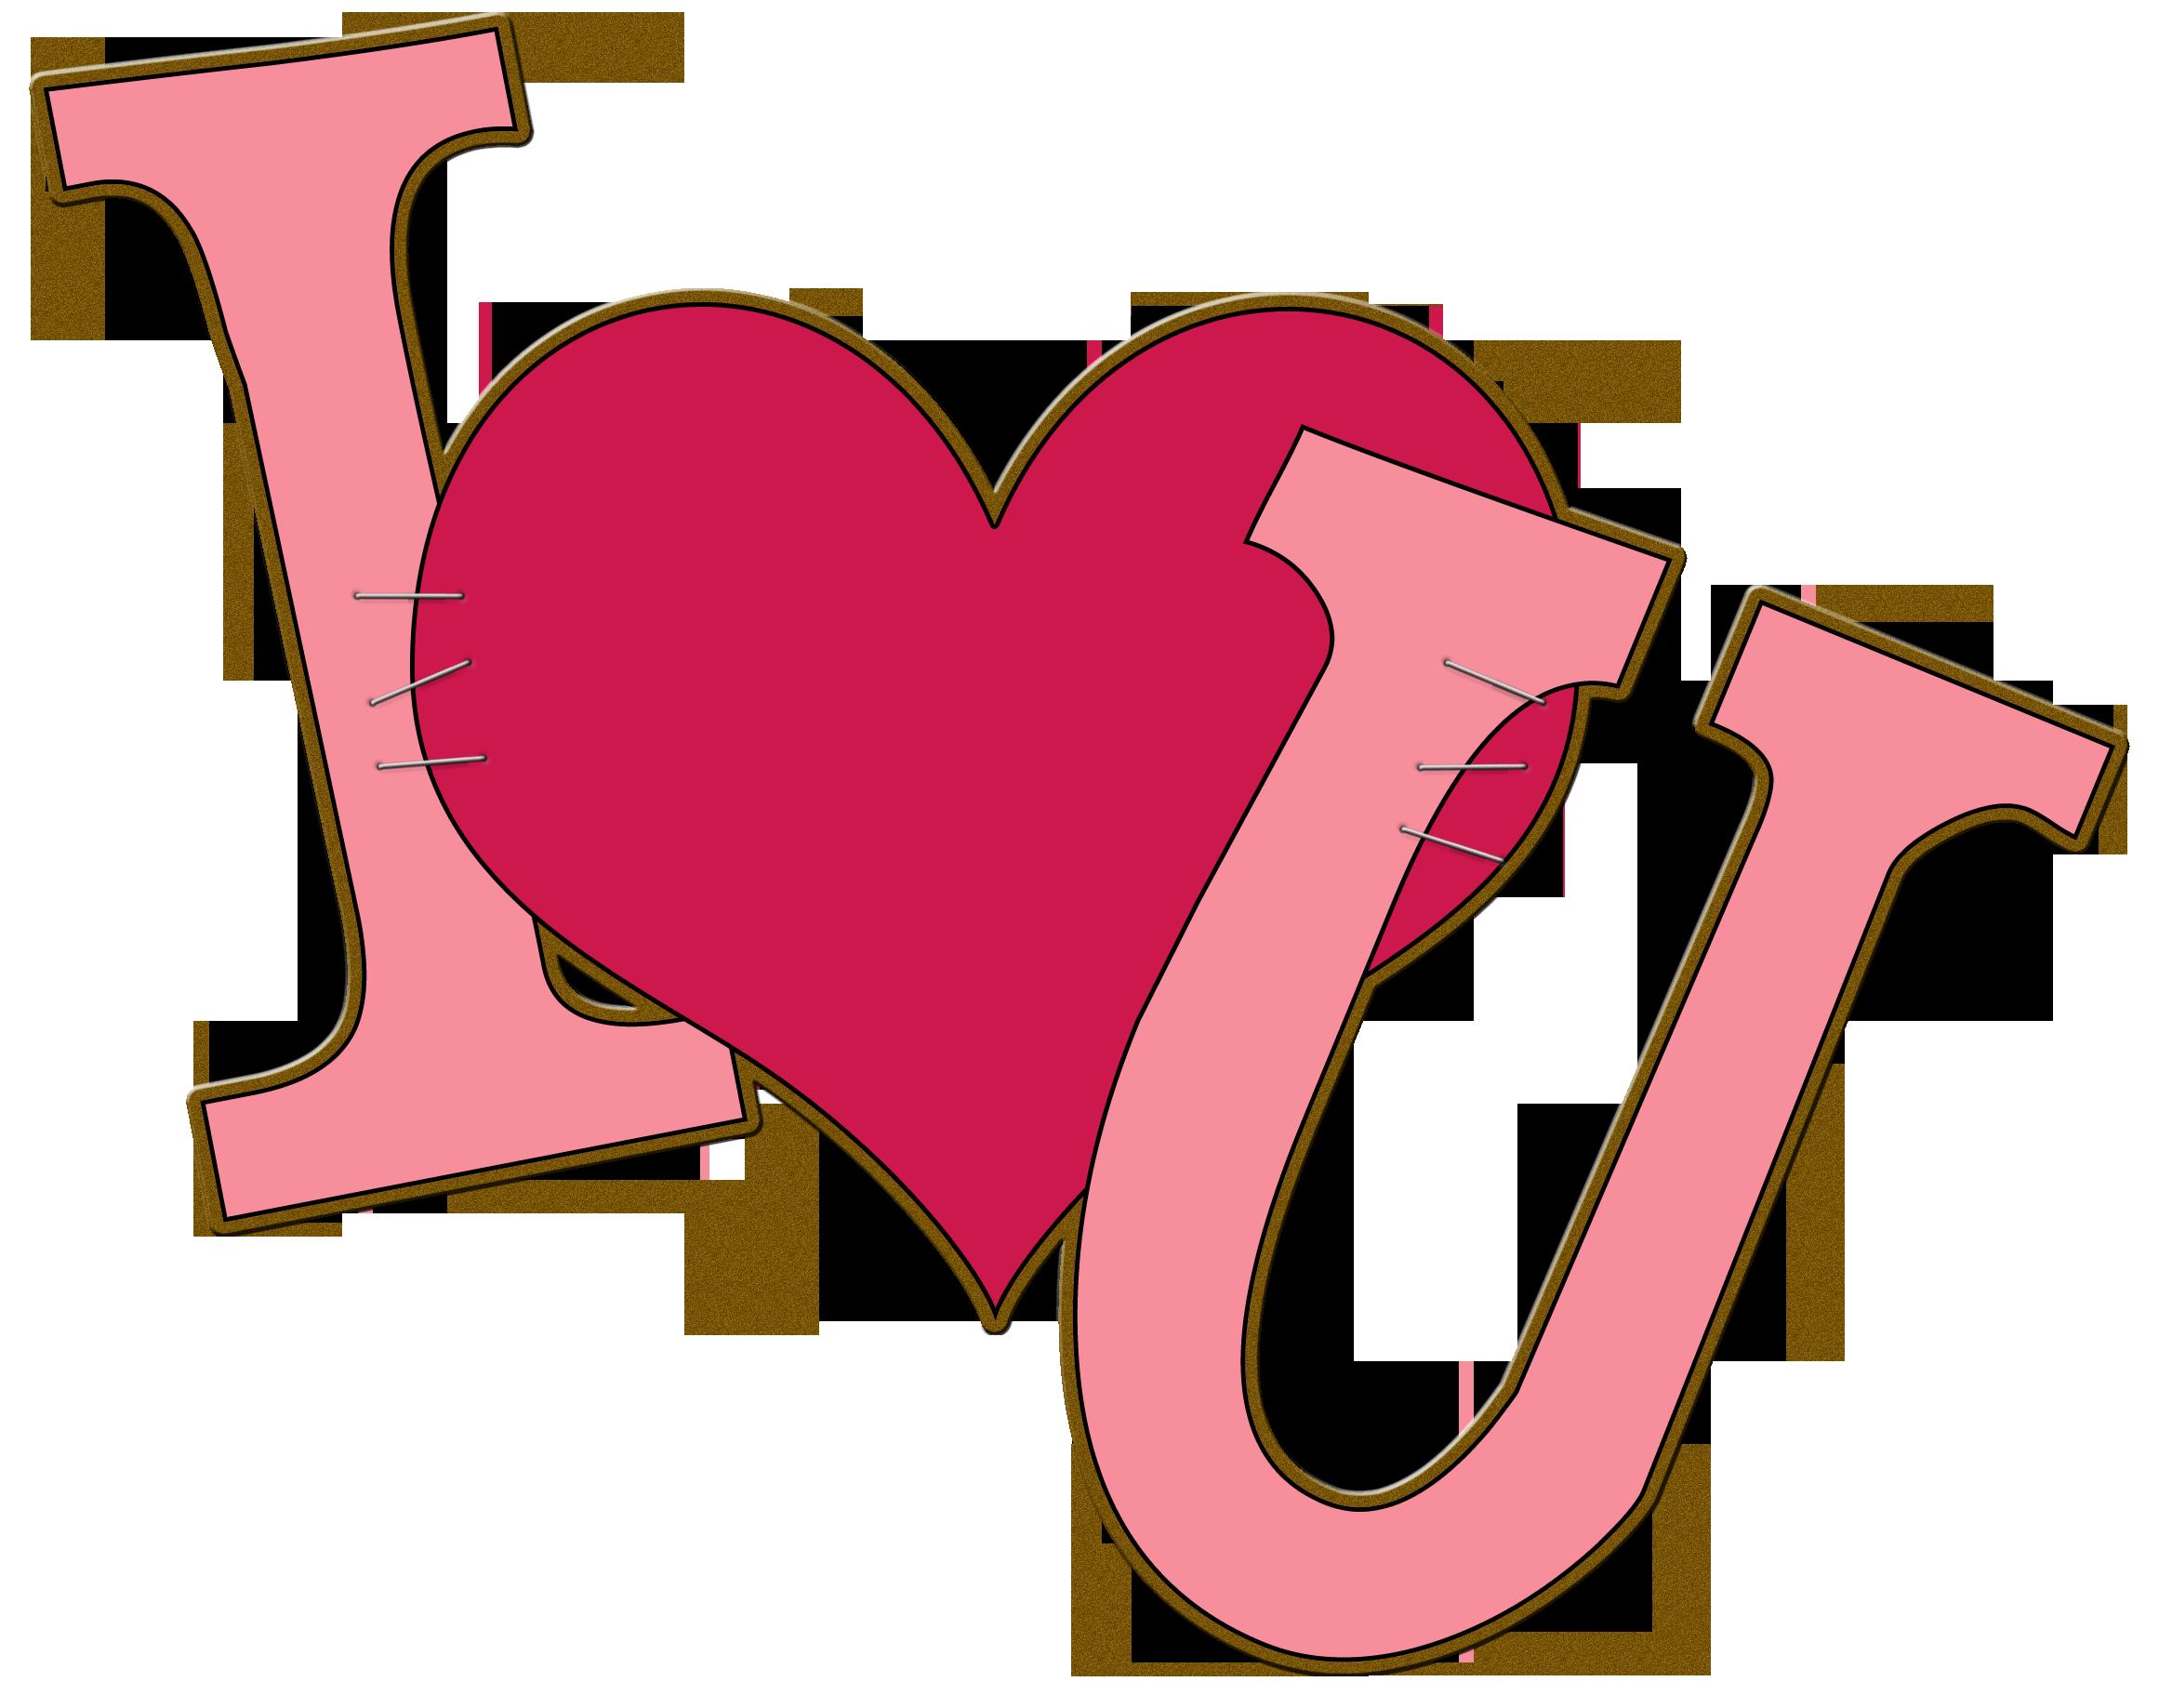 ... I Love You Clipart - clipartall ...-... I Love You Clipart - clipartall ...-13